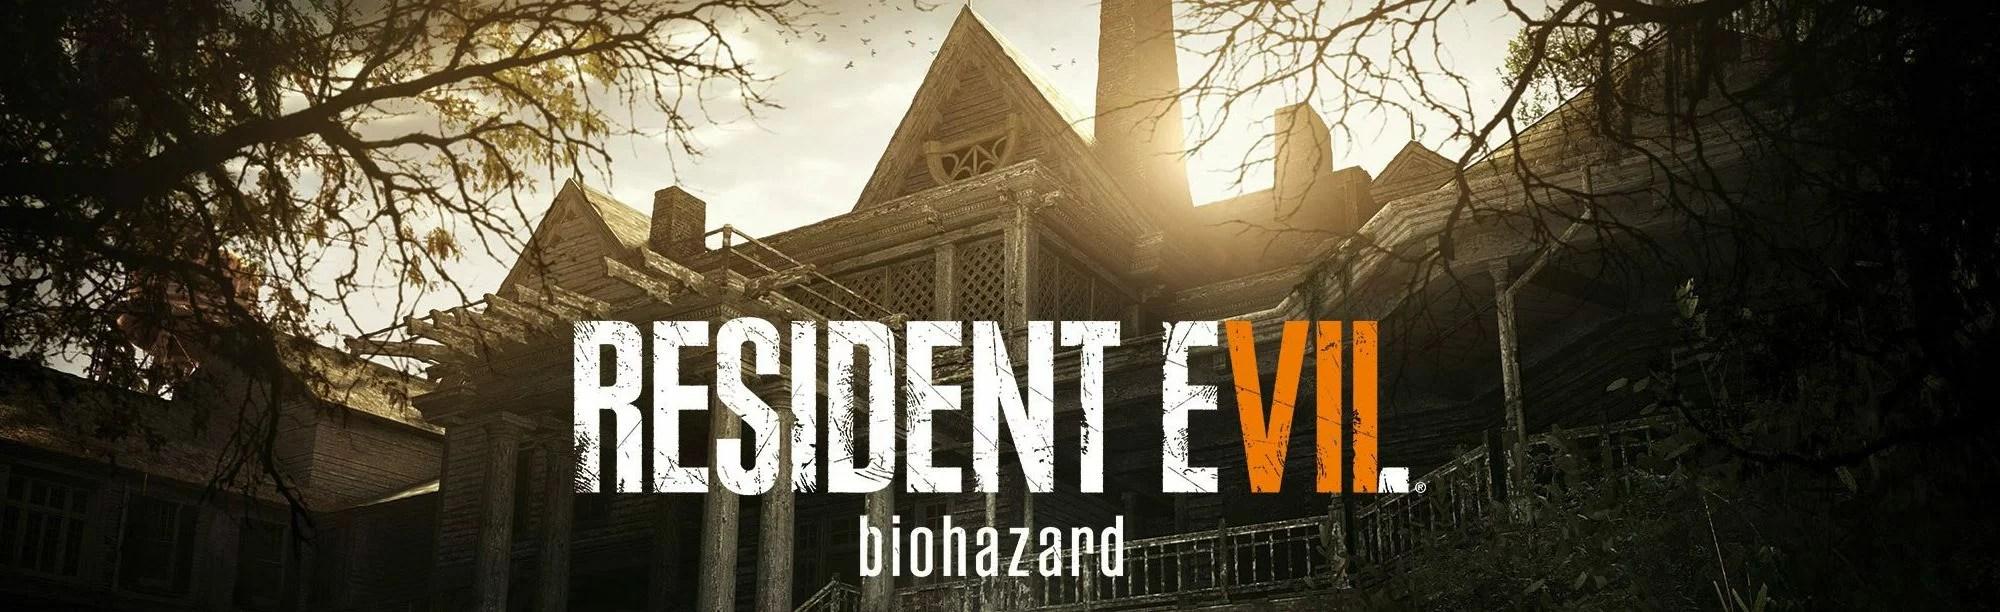 Image result for resident evil 7 banner